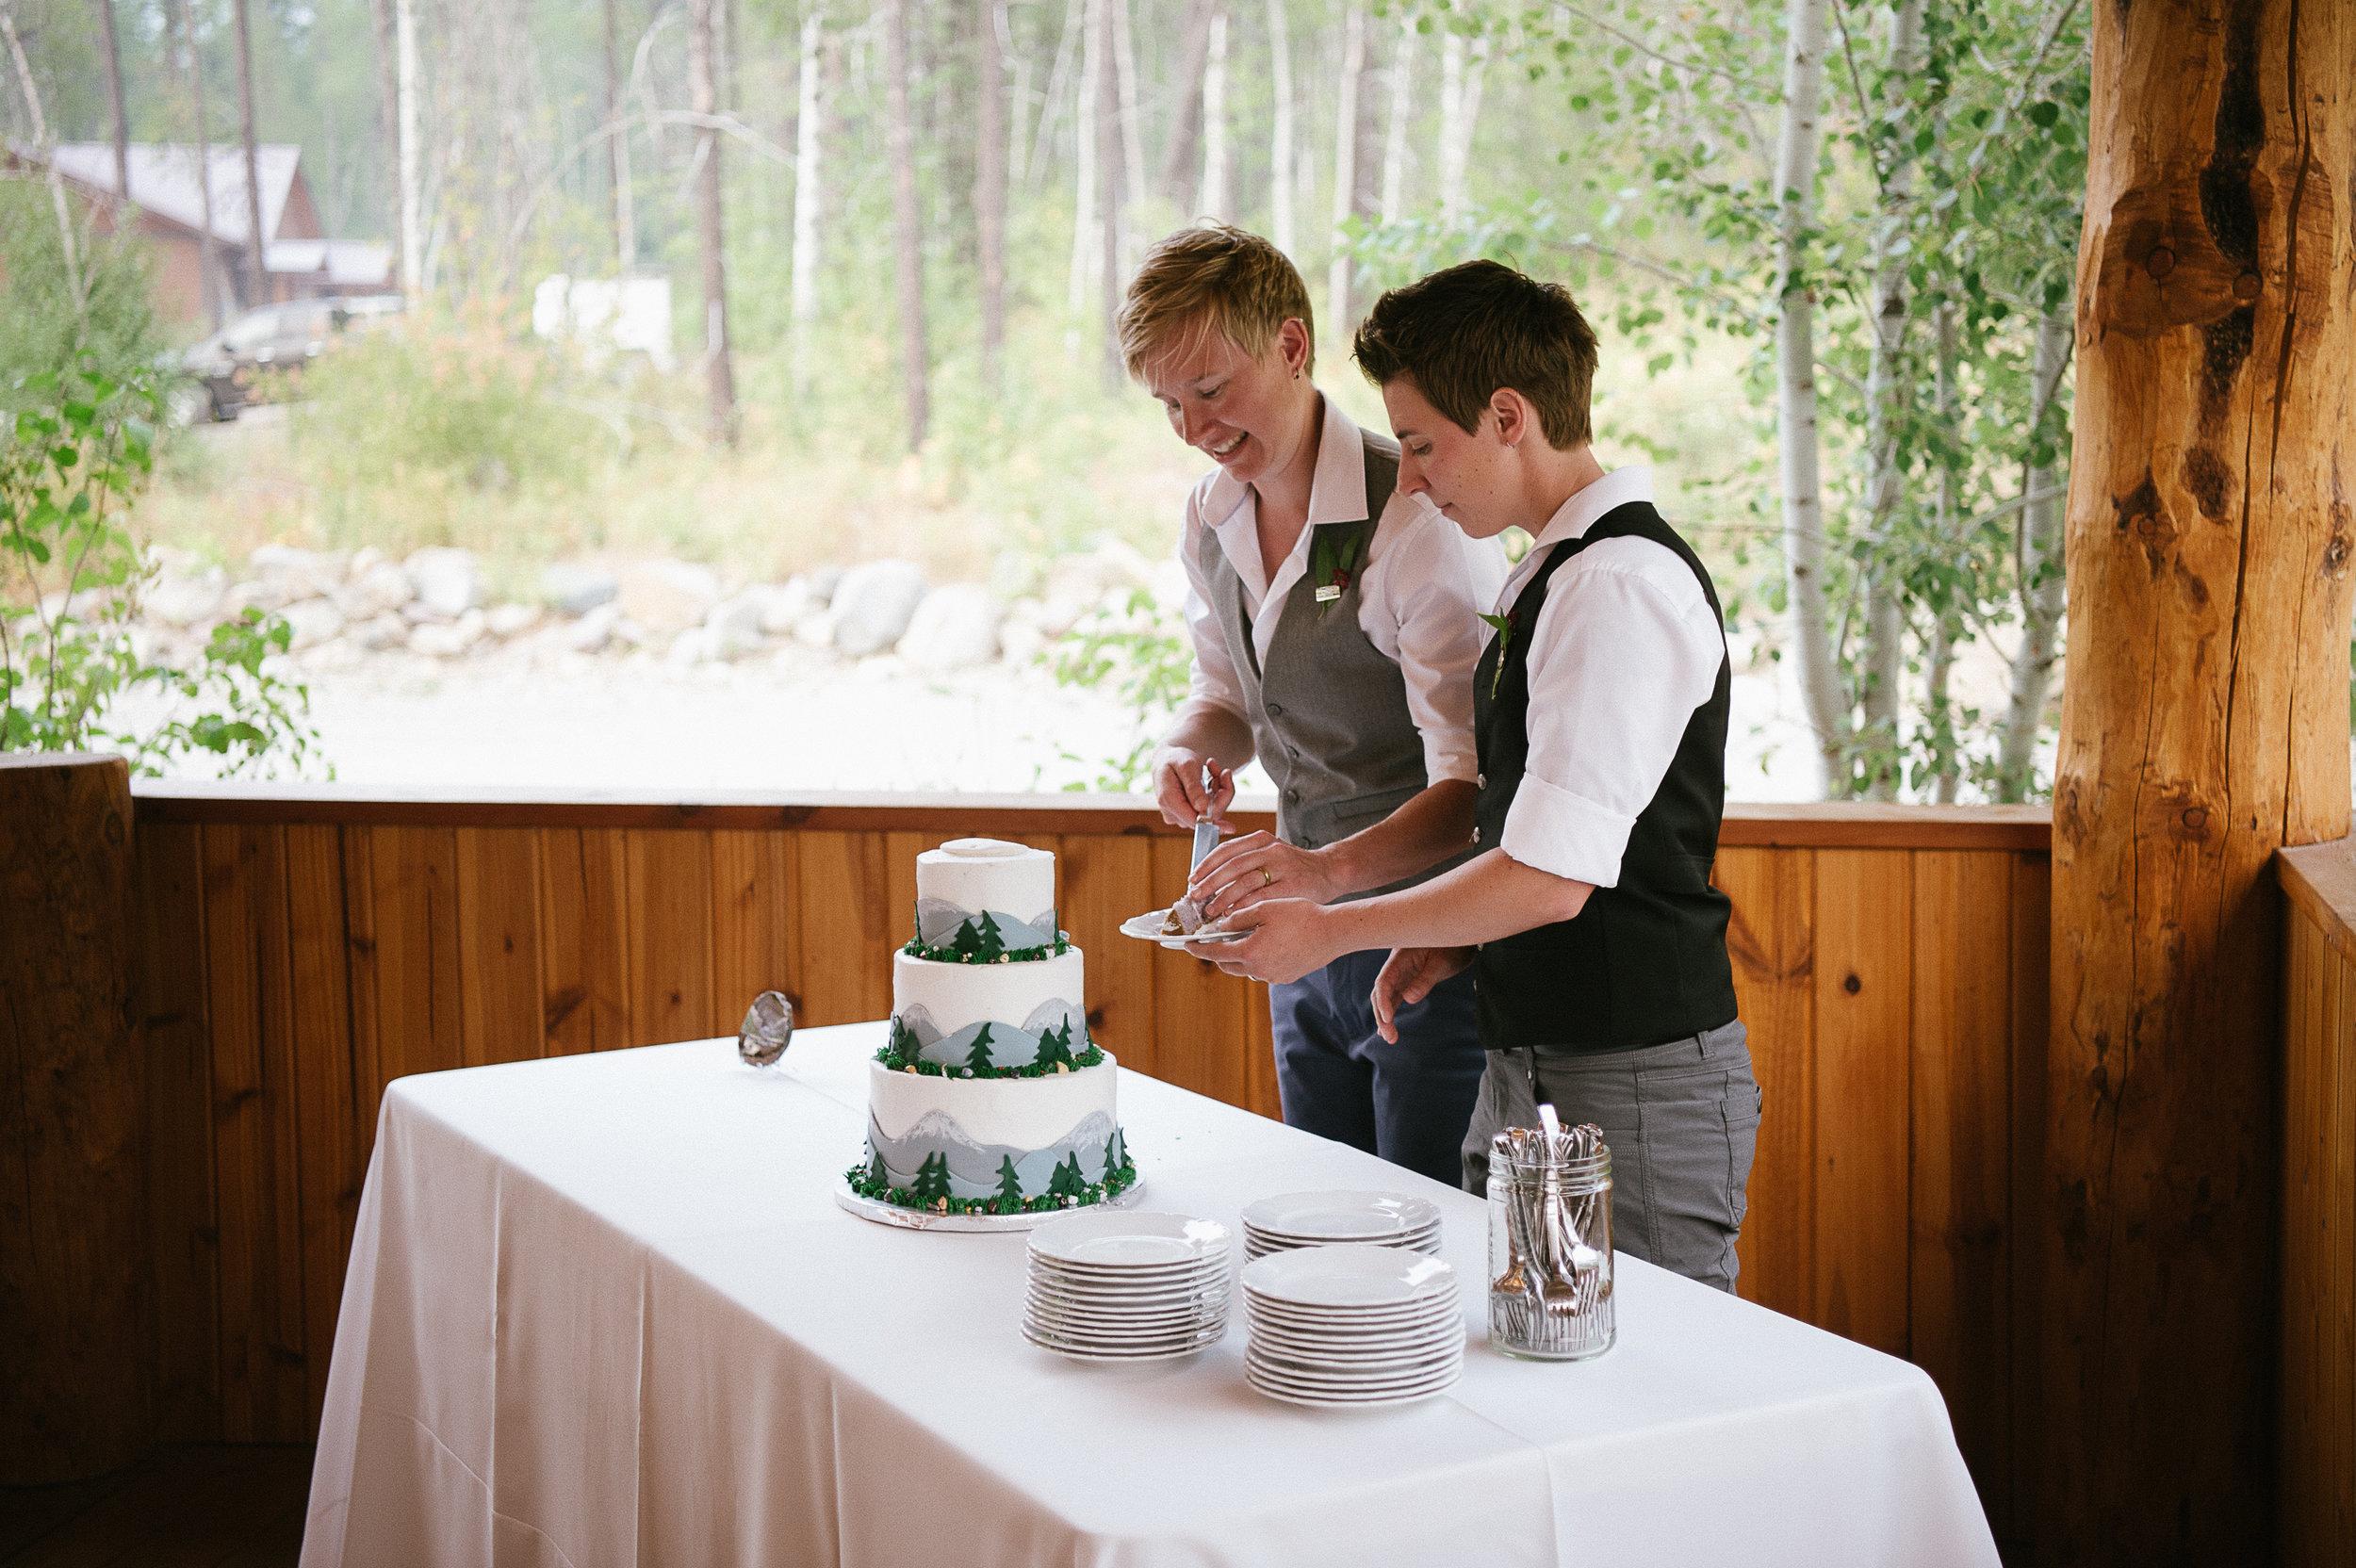 Glacier Montana Wedding_Elly Maurer + Frankie Dashiell Wedding_Beautiful Outdoor Wedding_Kelsey Lane Photography-5490-2.jpg